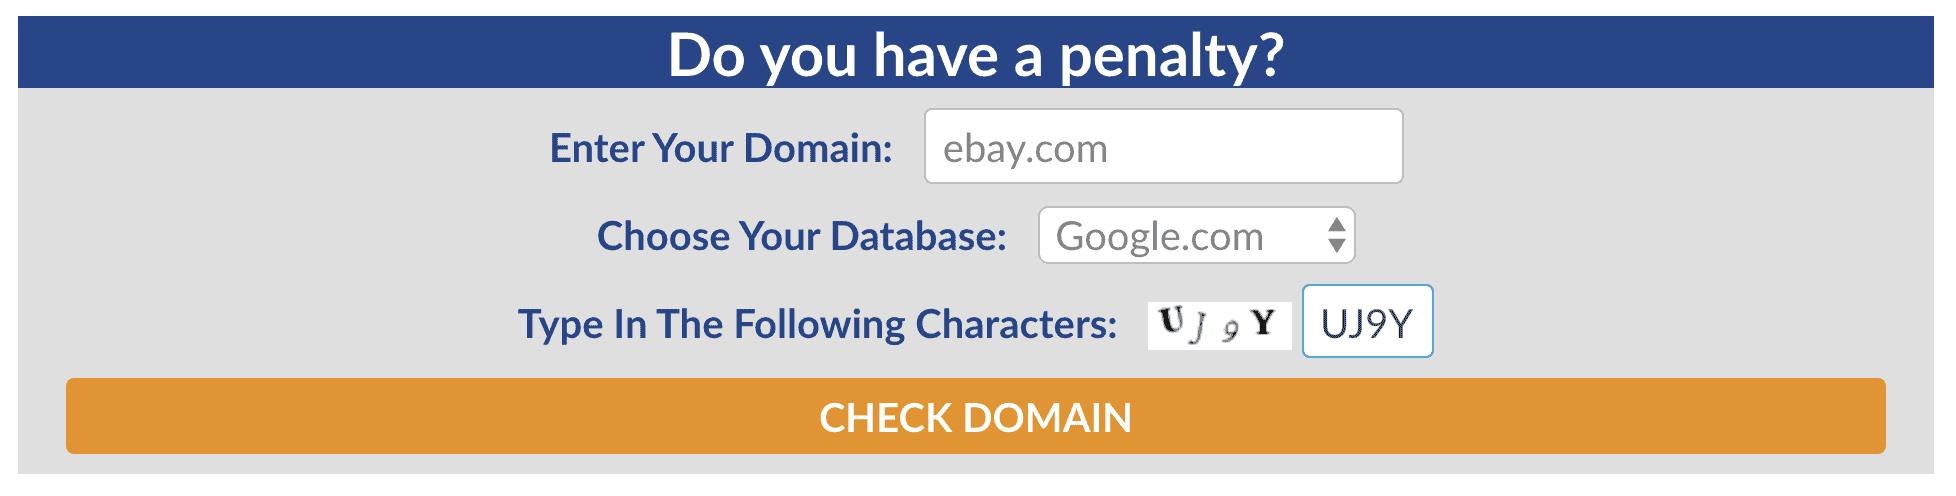 Website Penalty Indicator by FEinternational